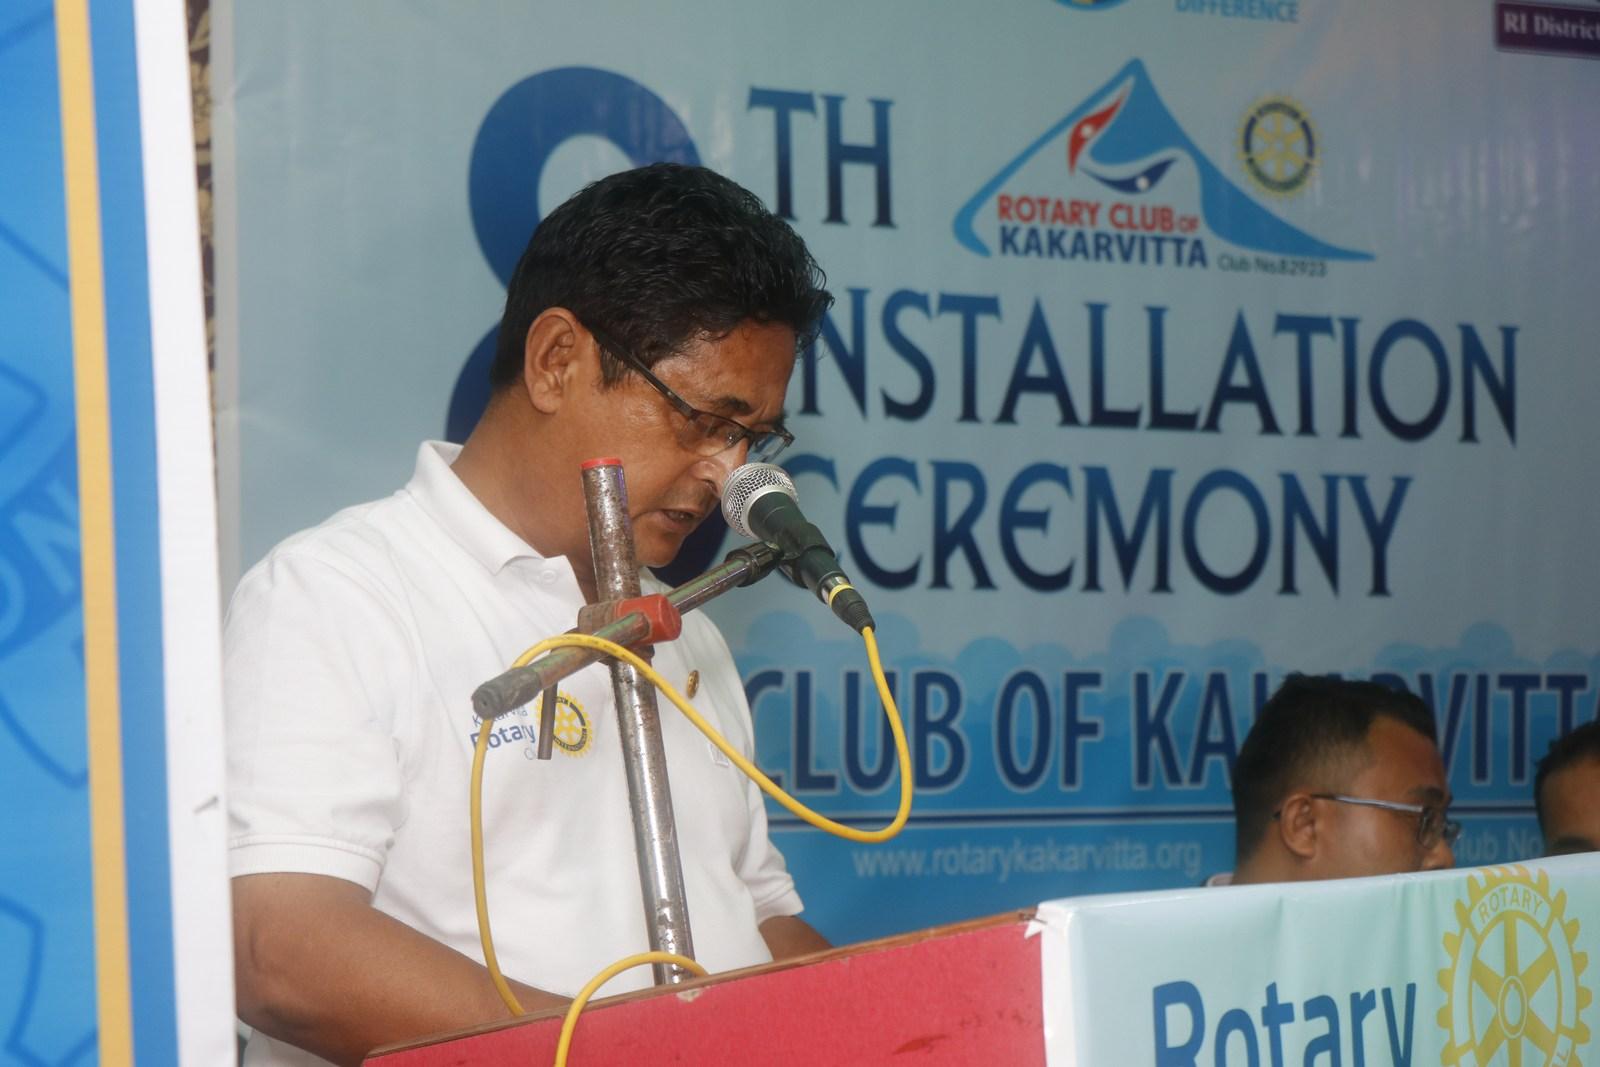 8th-Installation-Ceremony-Rotary-Club-of-Kakarvitta-20